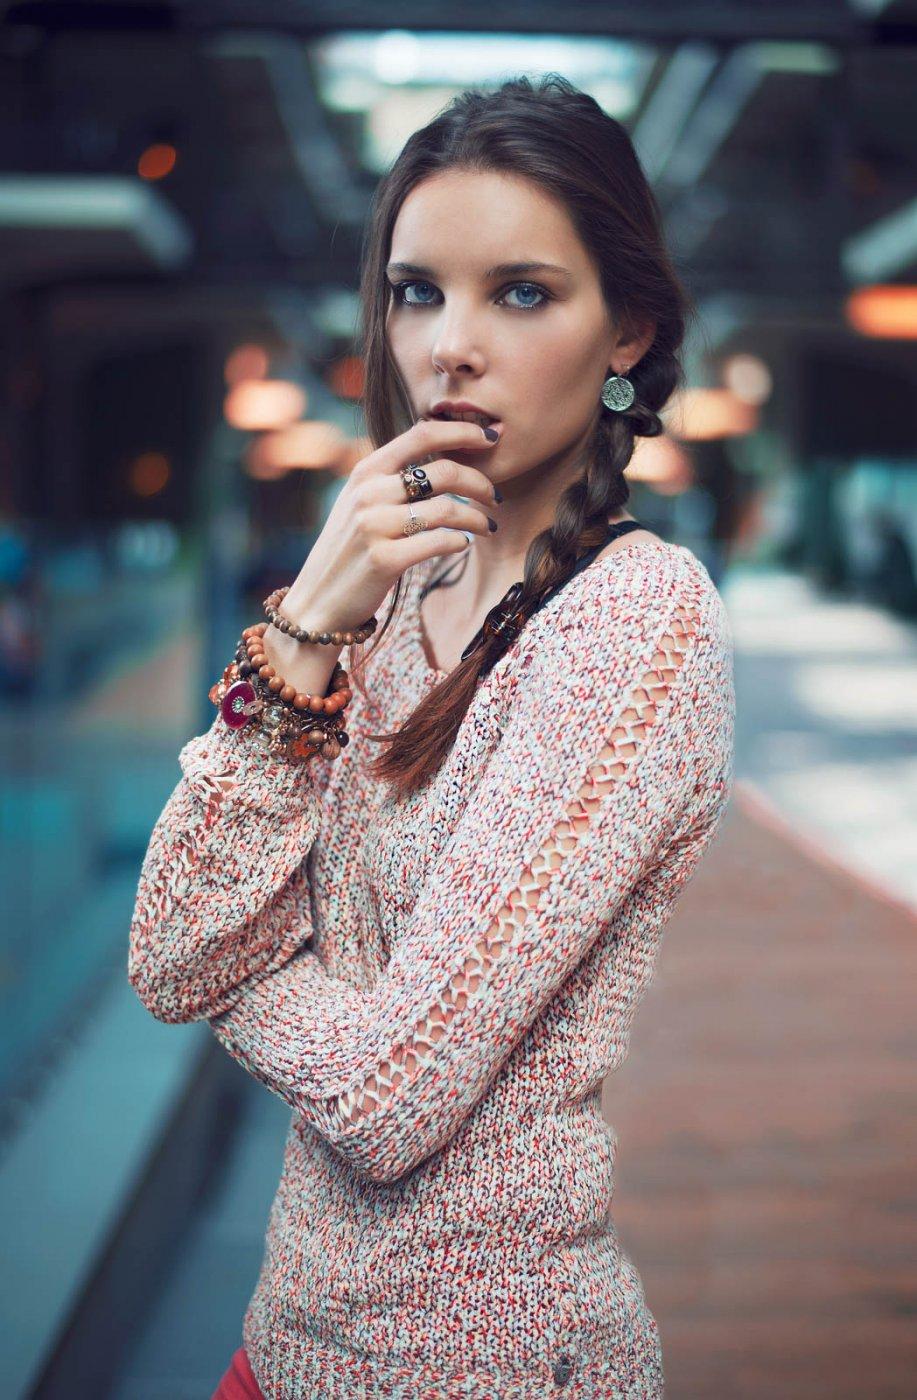 Fashion Portrait Photography By Anastasia Vervueren Bokeh